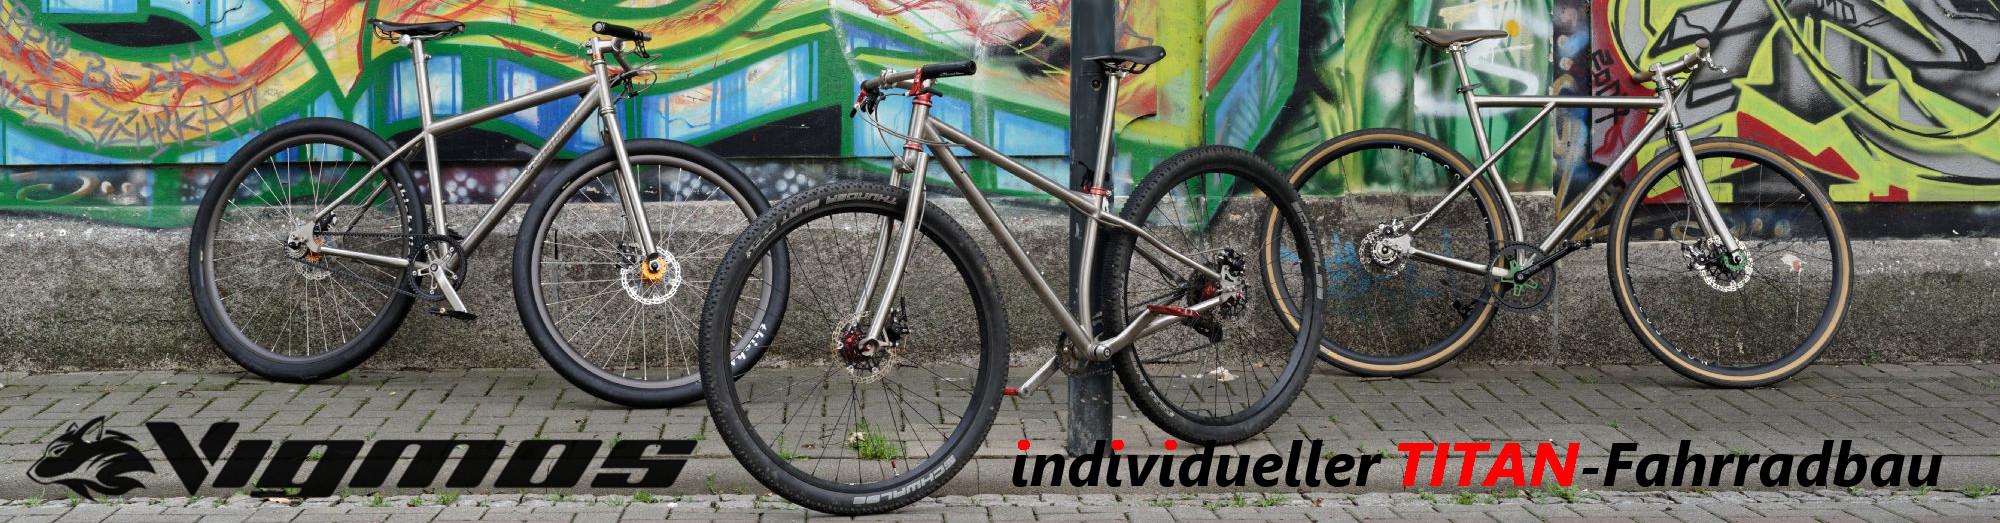 Individueller Fahrradbau - Titanteile Logo